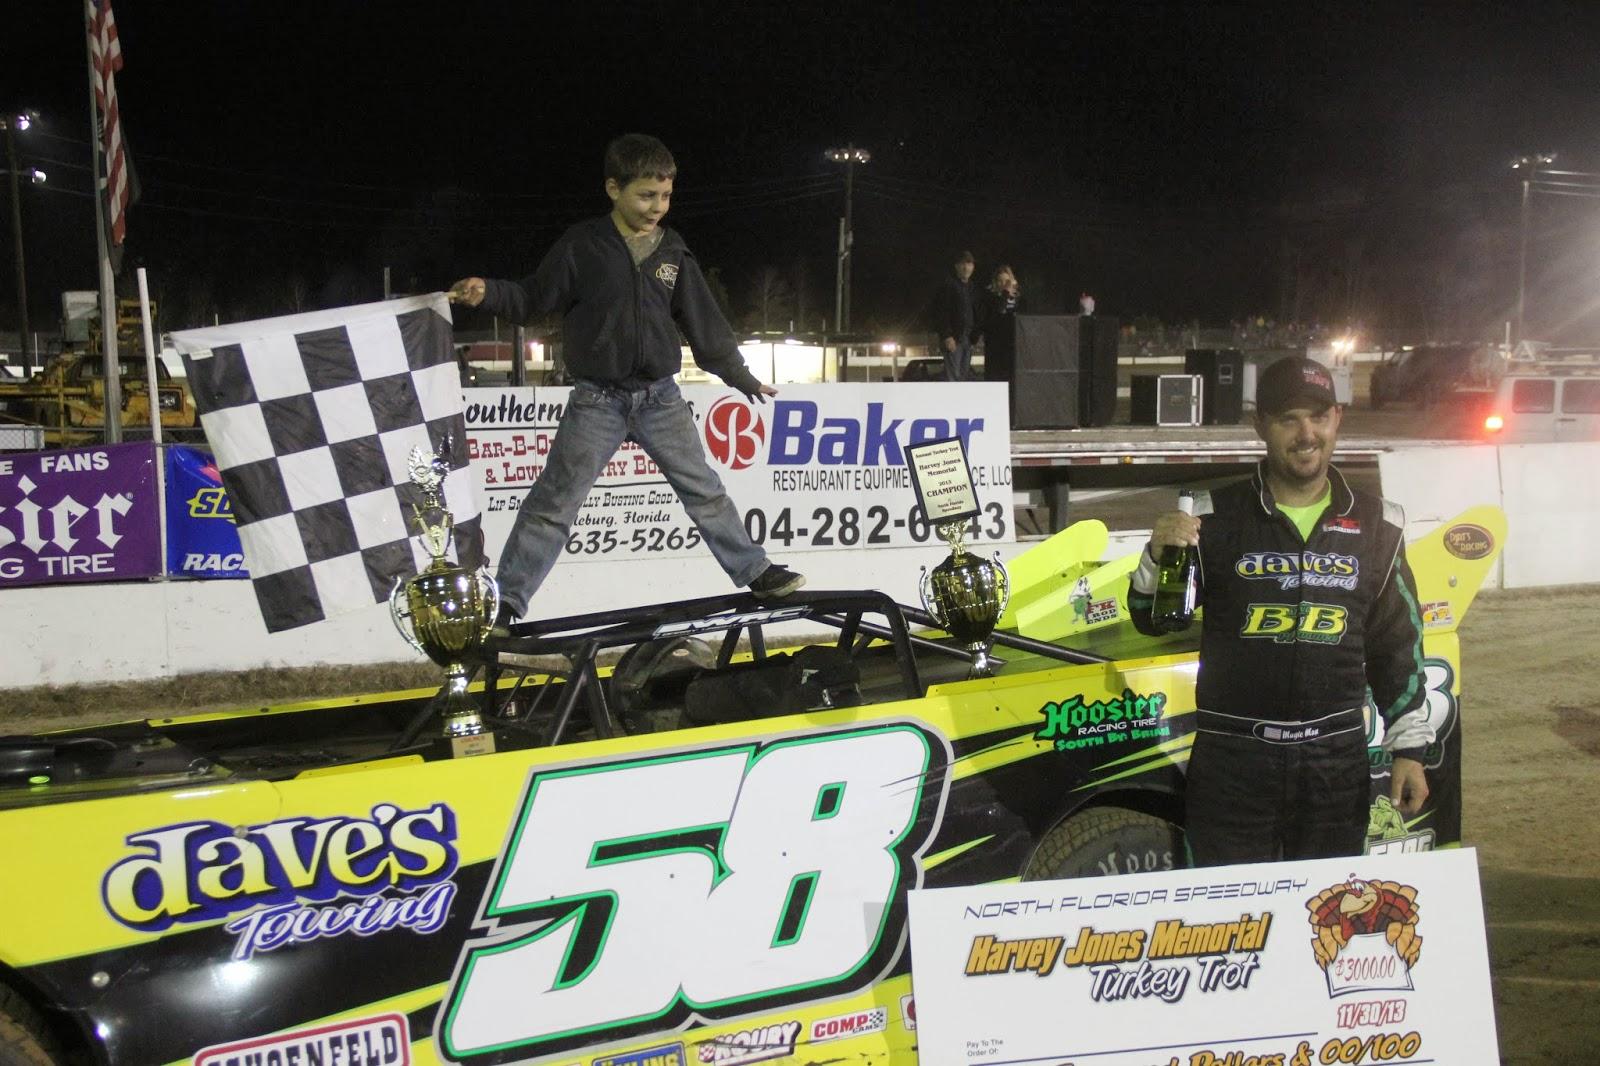 Bubba Raceway Park >> Deep Dixie Racing: Mark Whitener Wins UDLMS Race And ...